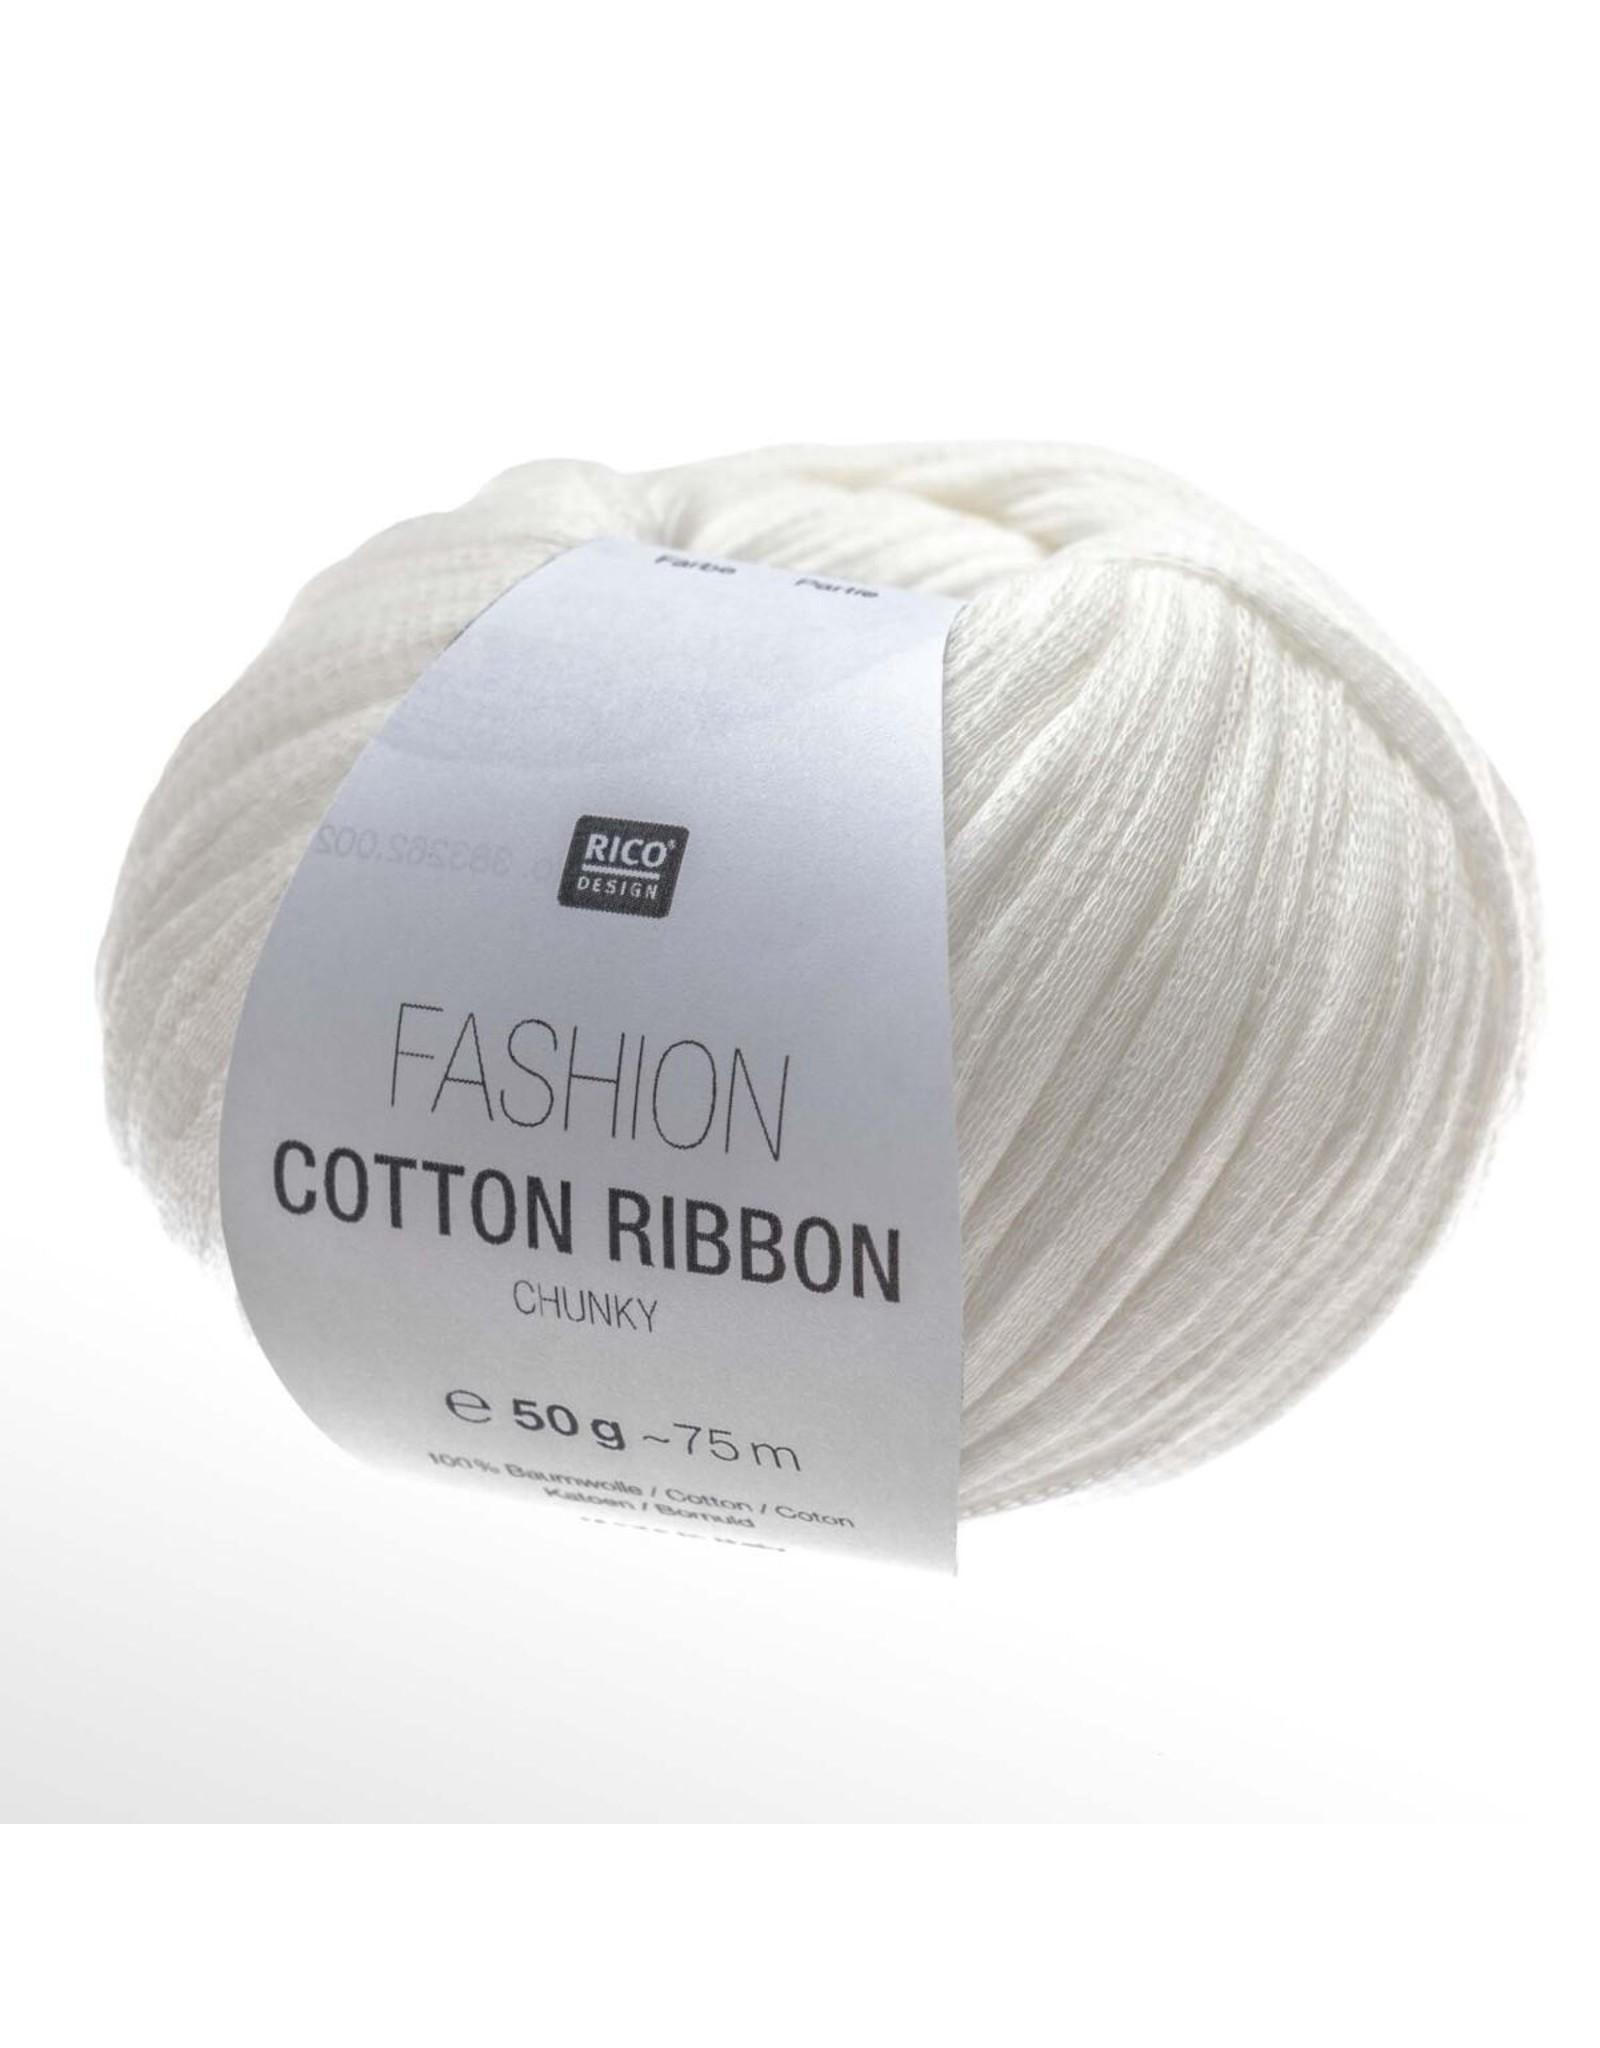 Rico Rico Fashion Cotton Ribbon Chunky